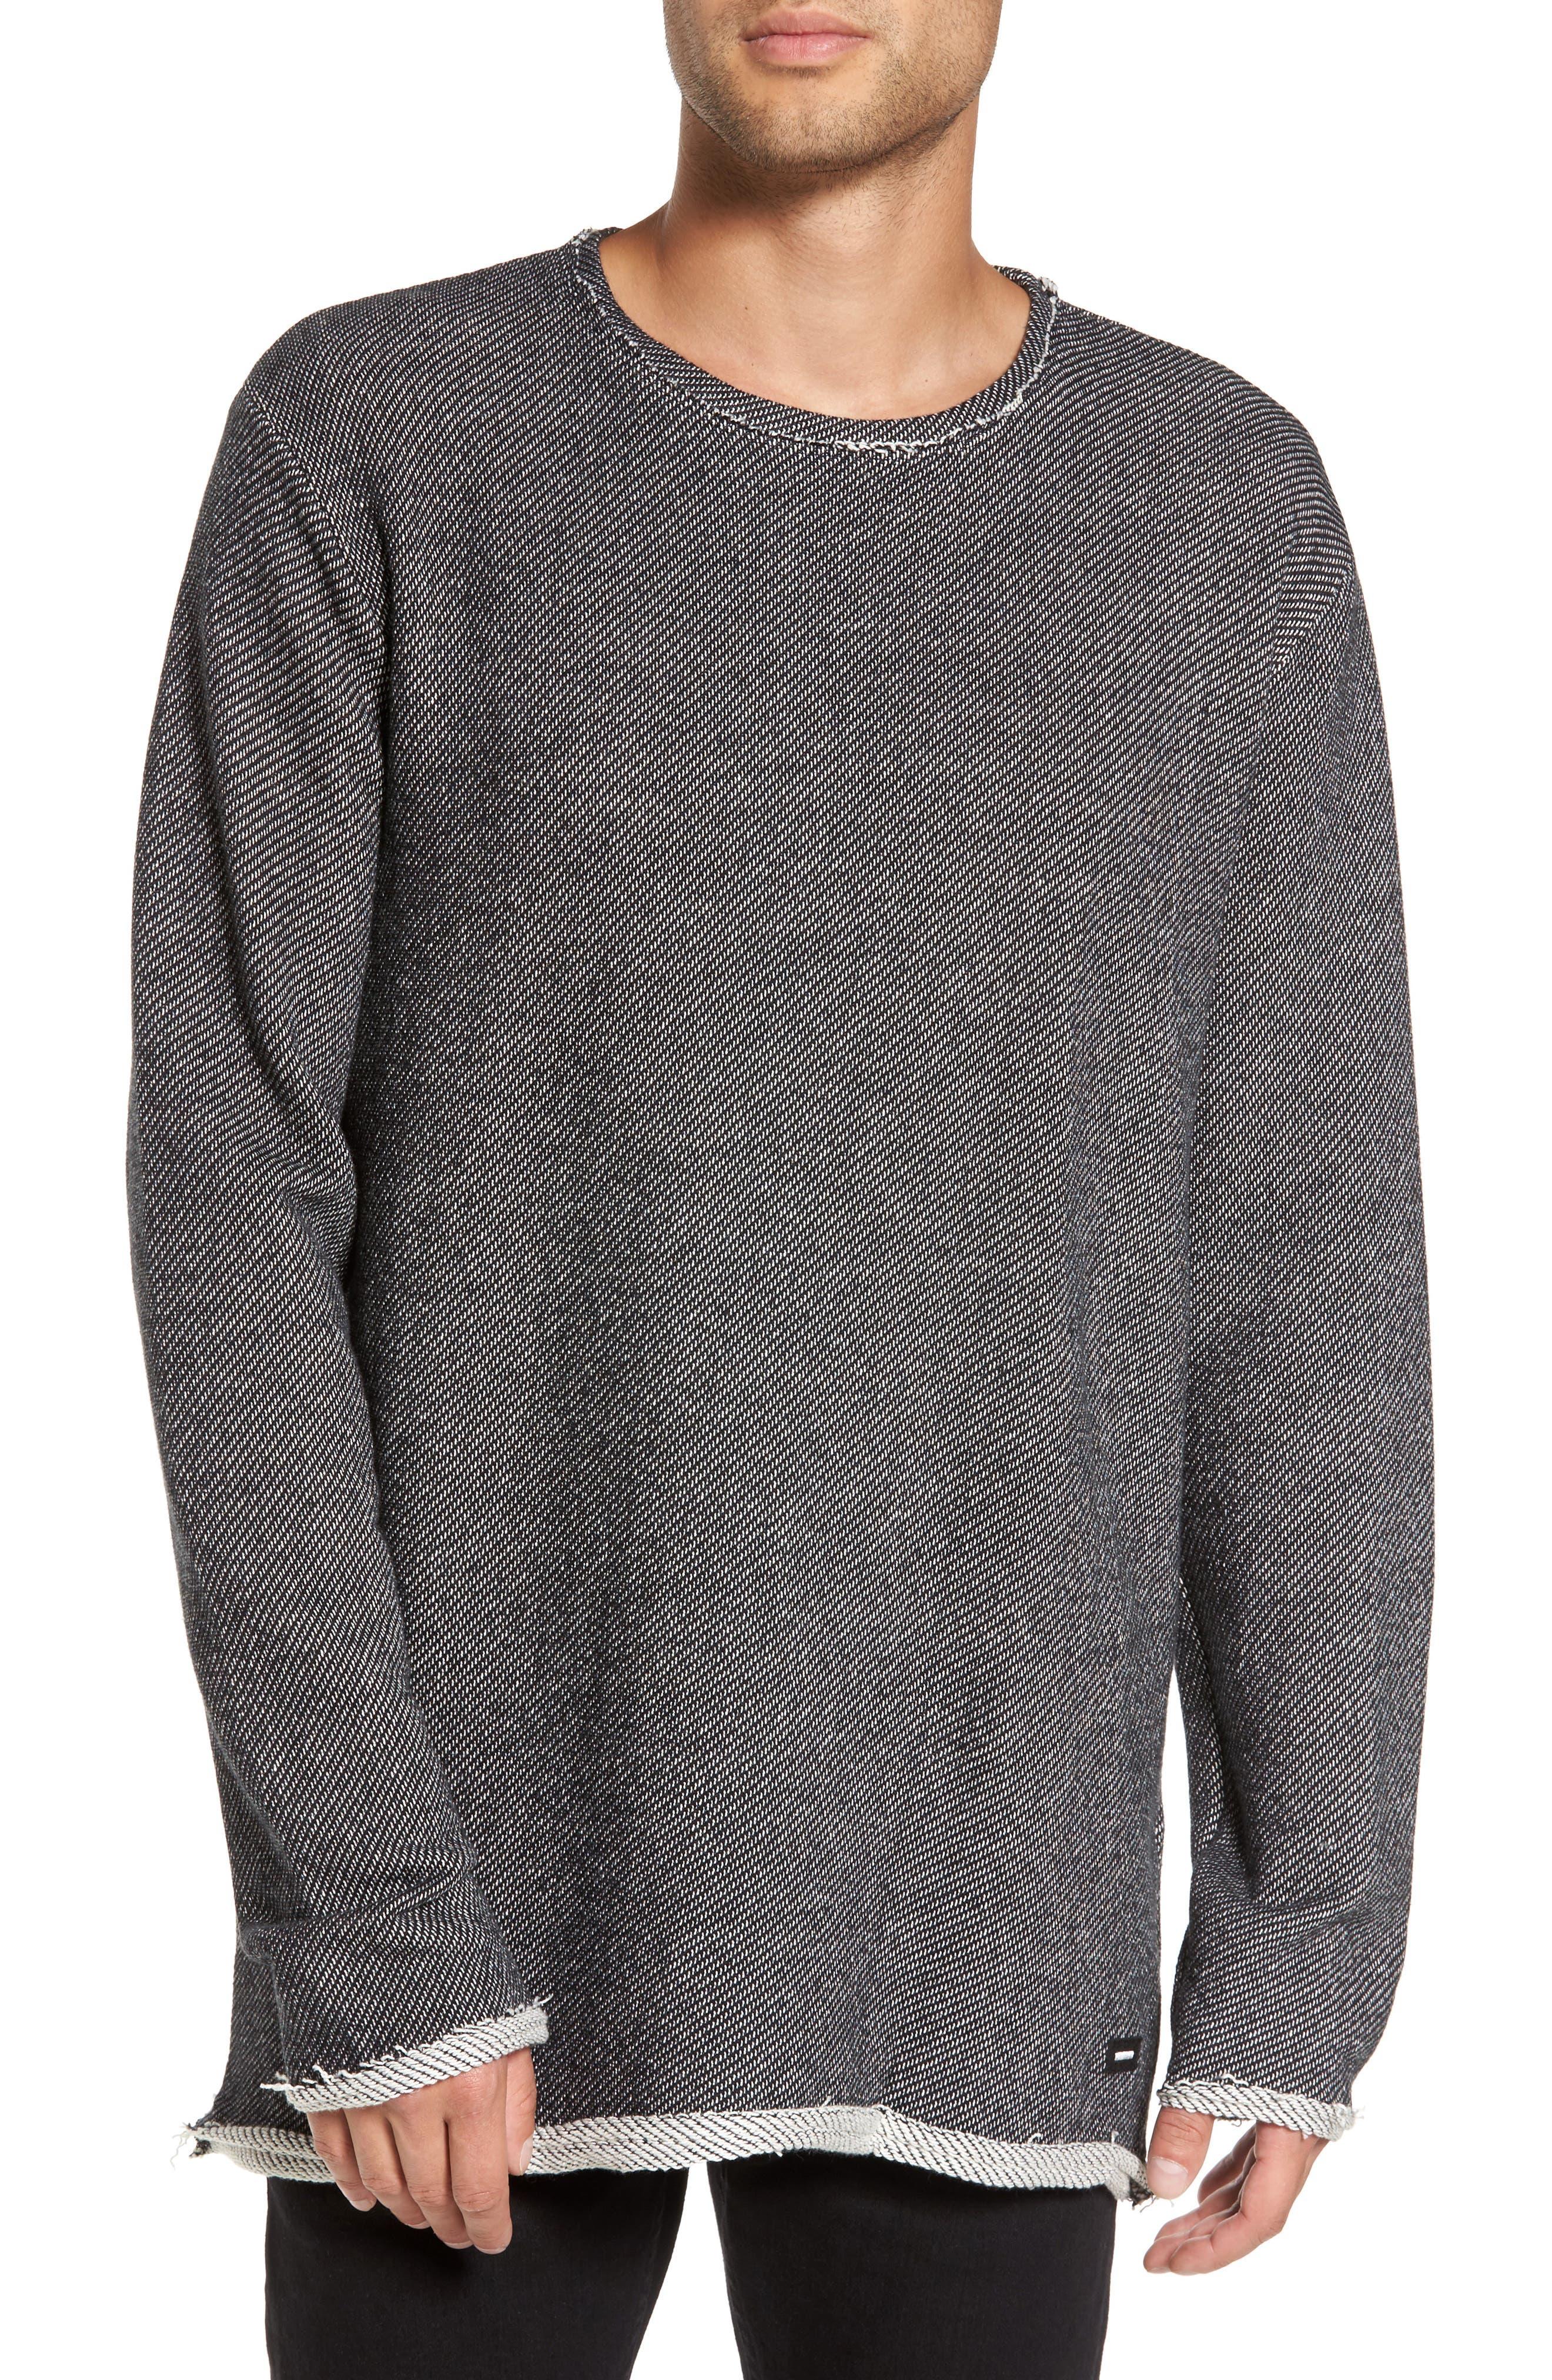 Ralf Sweater,                         Main,                         color, Black Noise